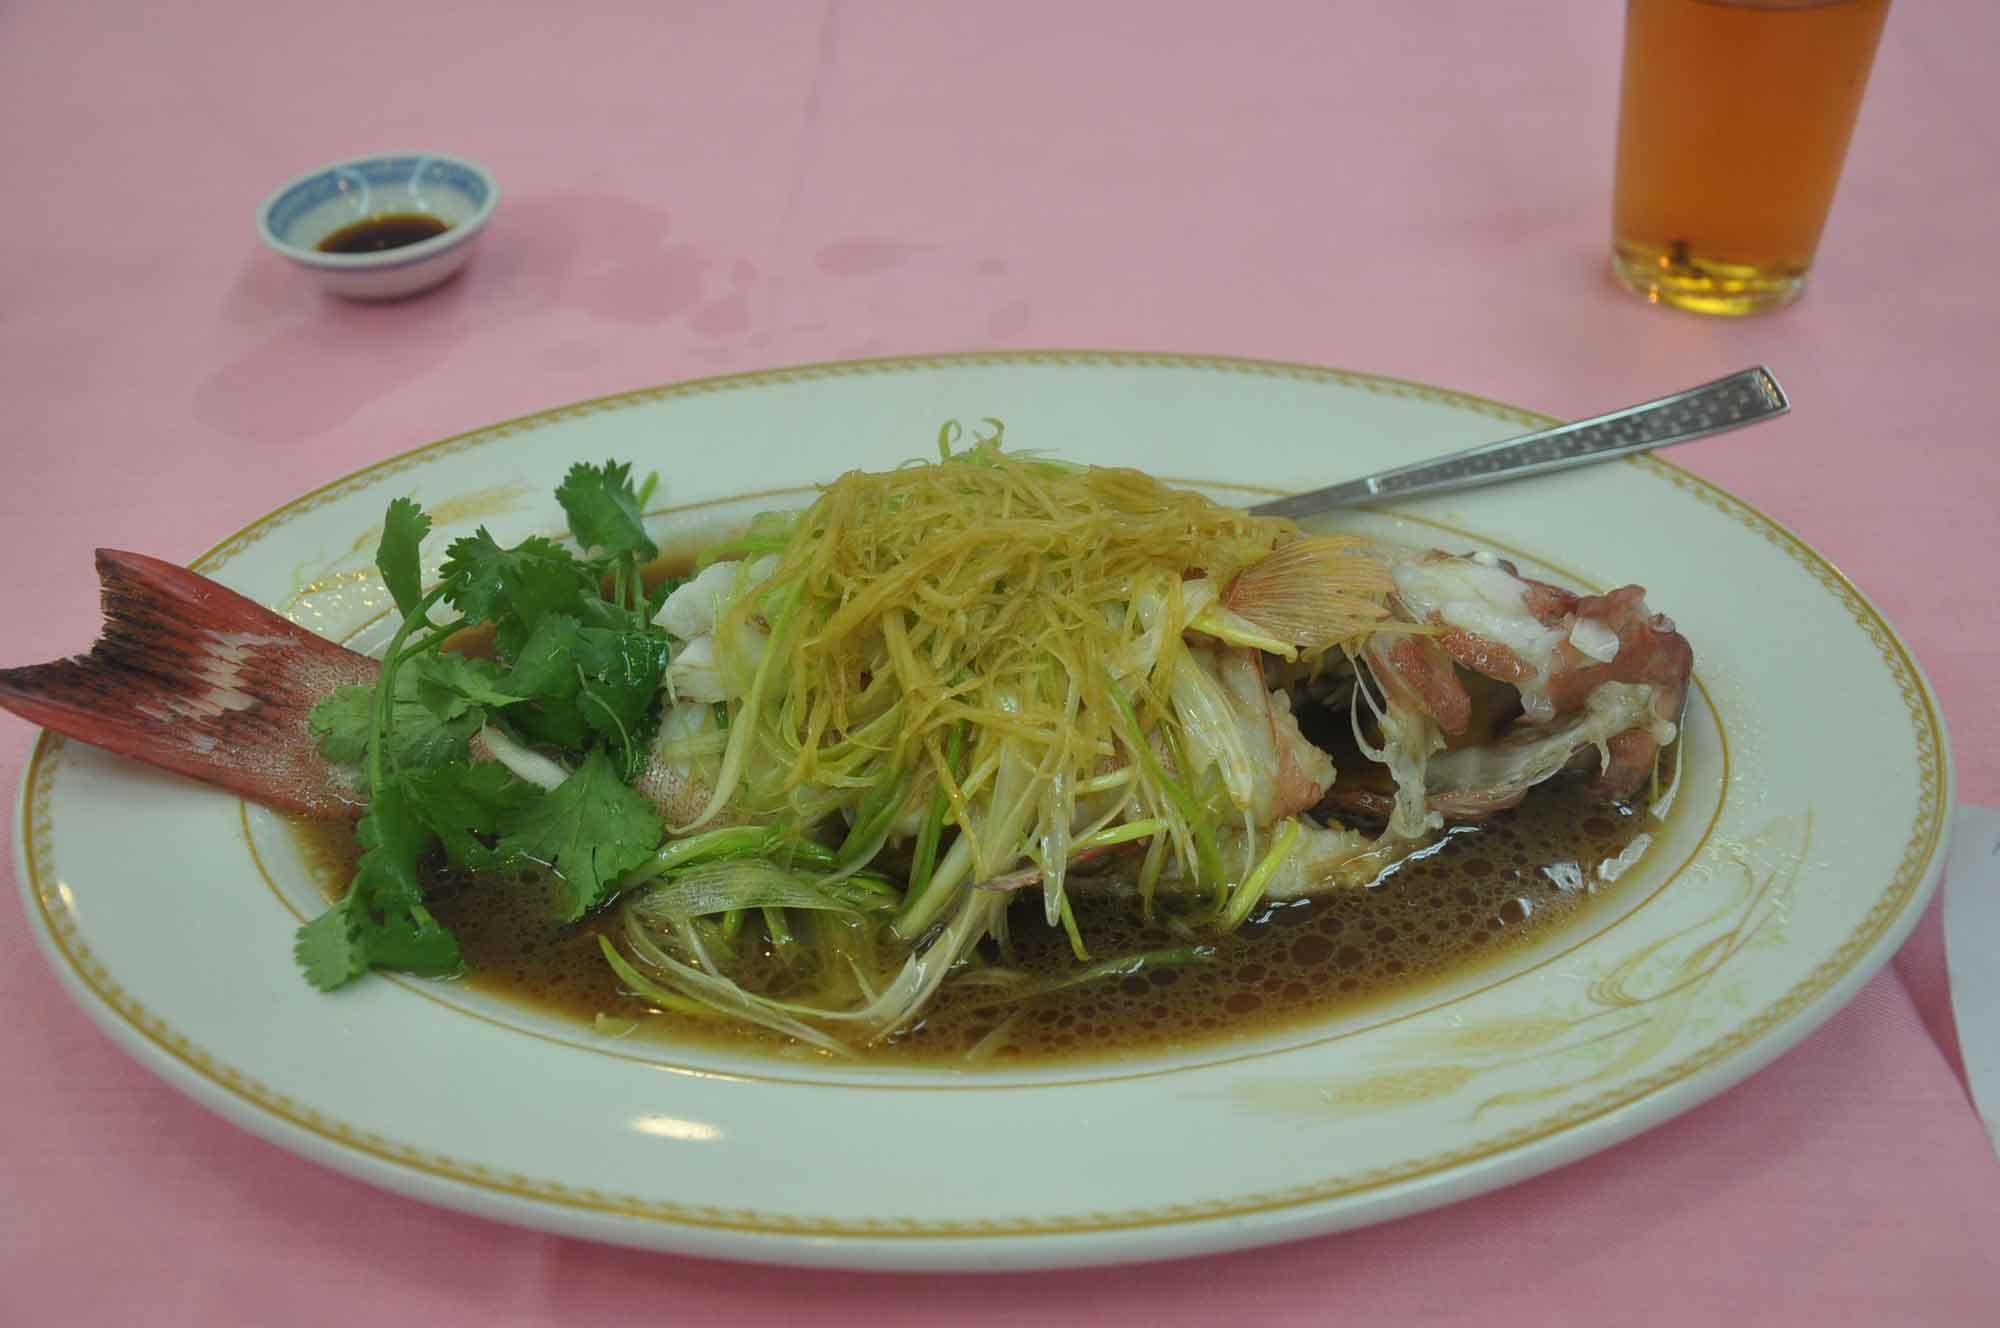 Southwest Restaurant Macau fish